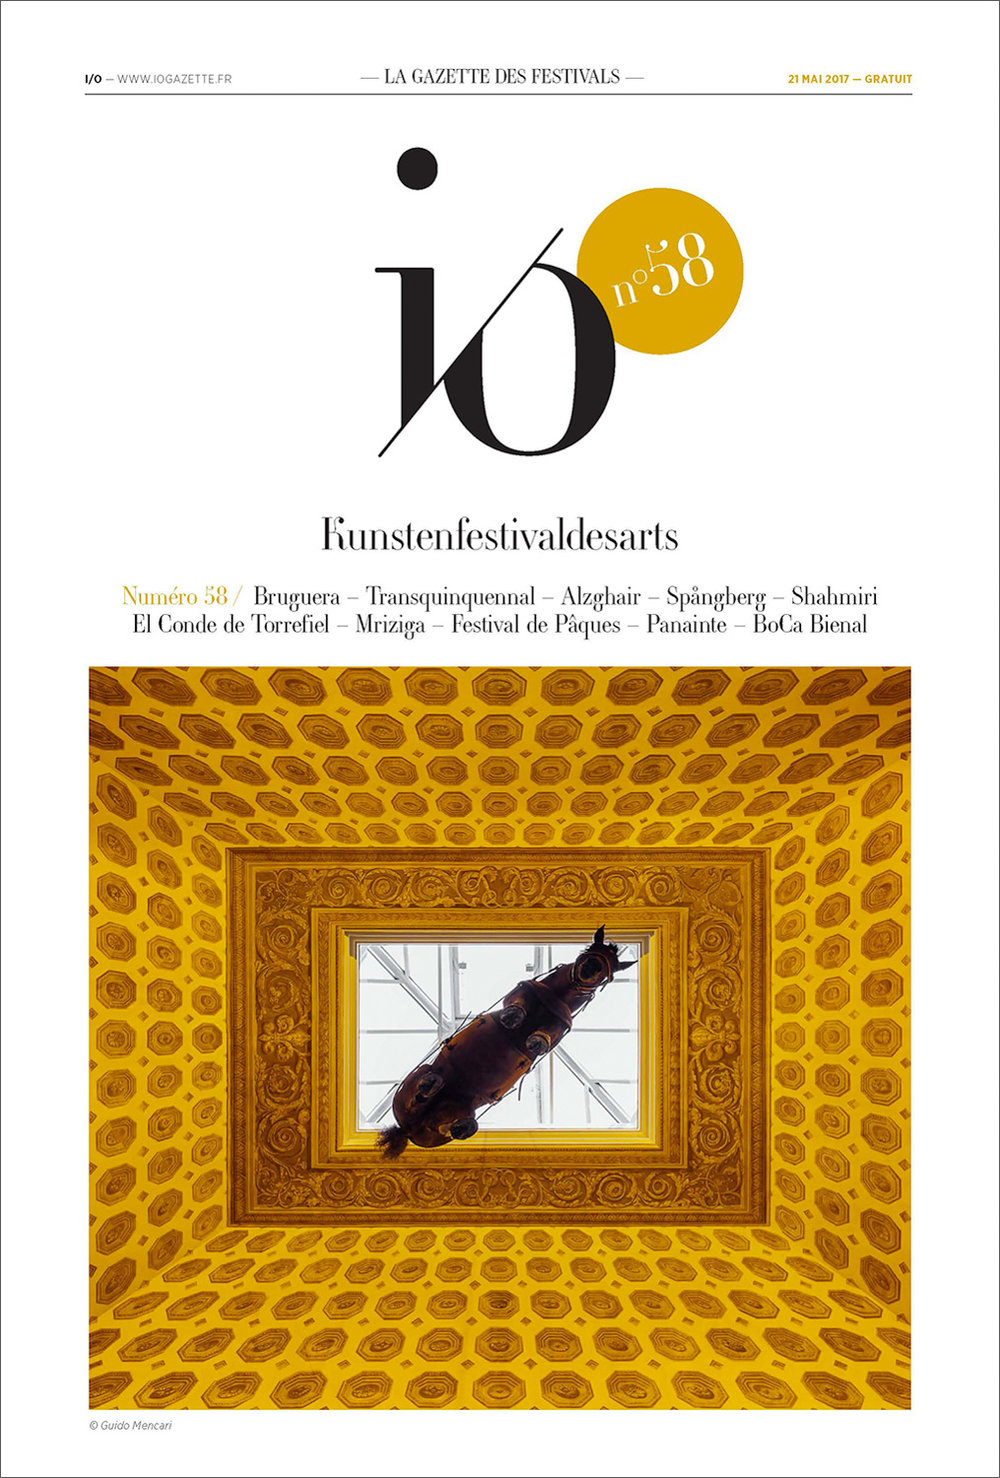 Maurizio Cattelan | Novecento    Magazine cover   Io Gazzette, 2017